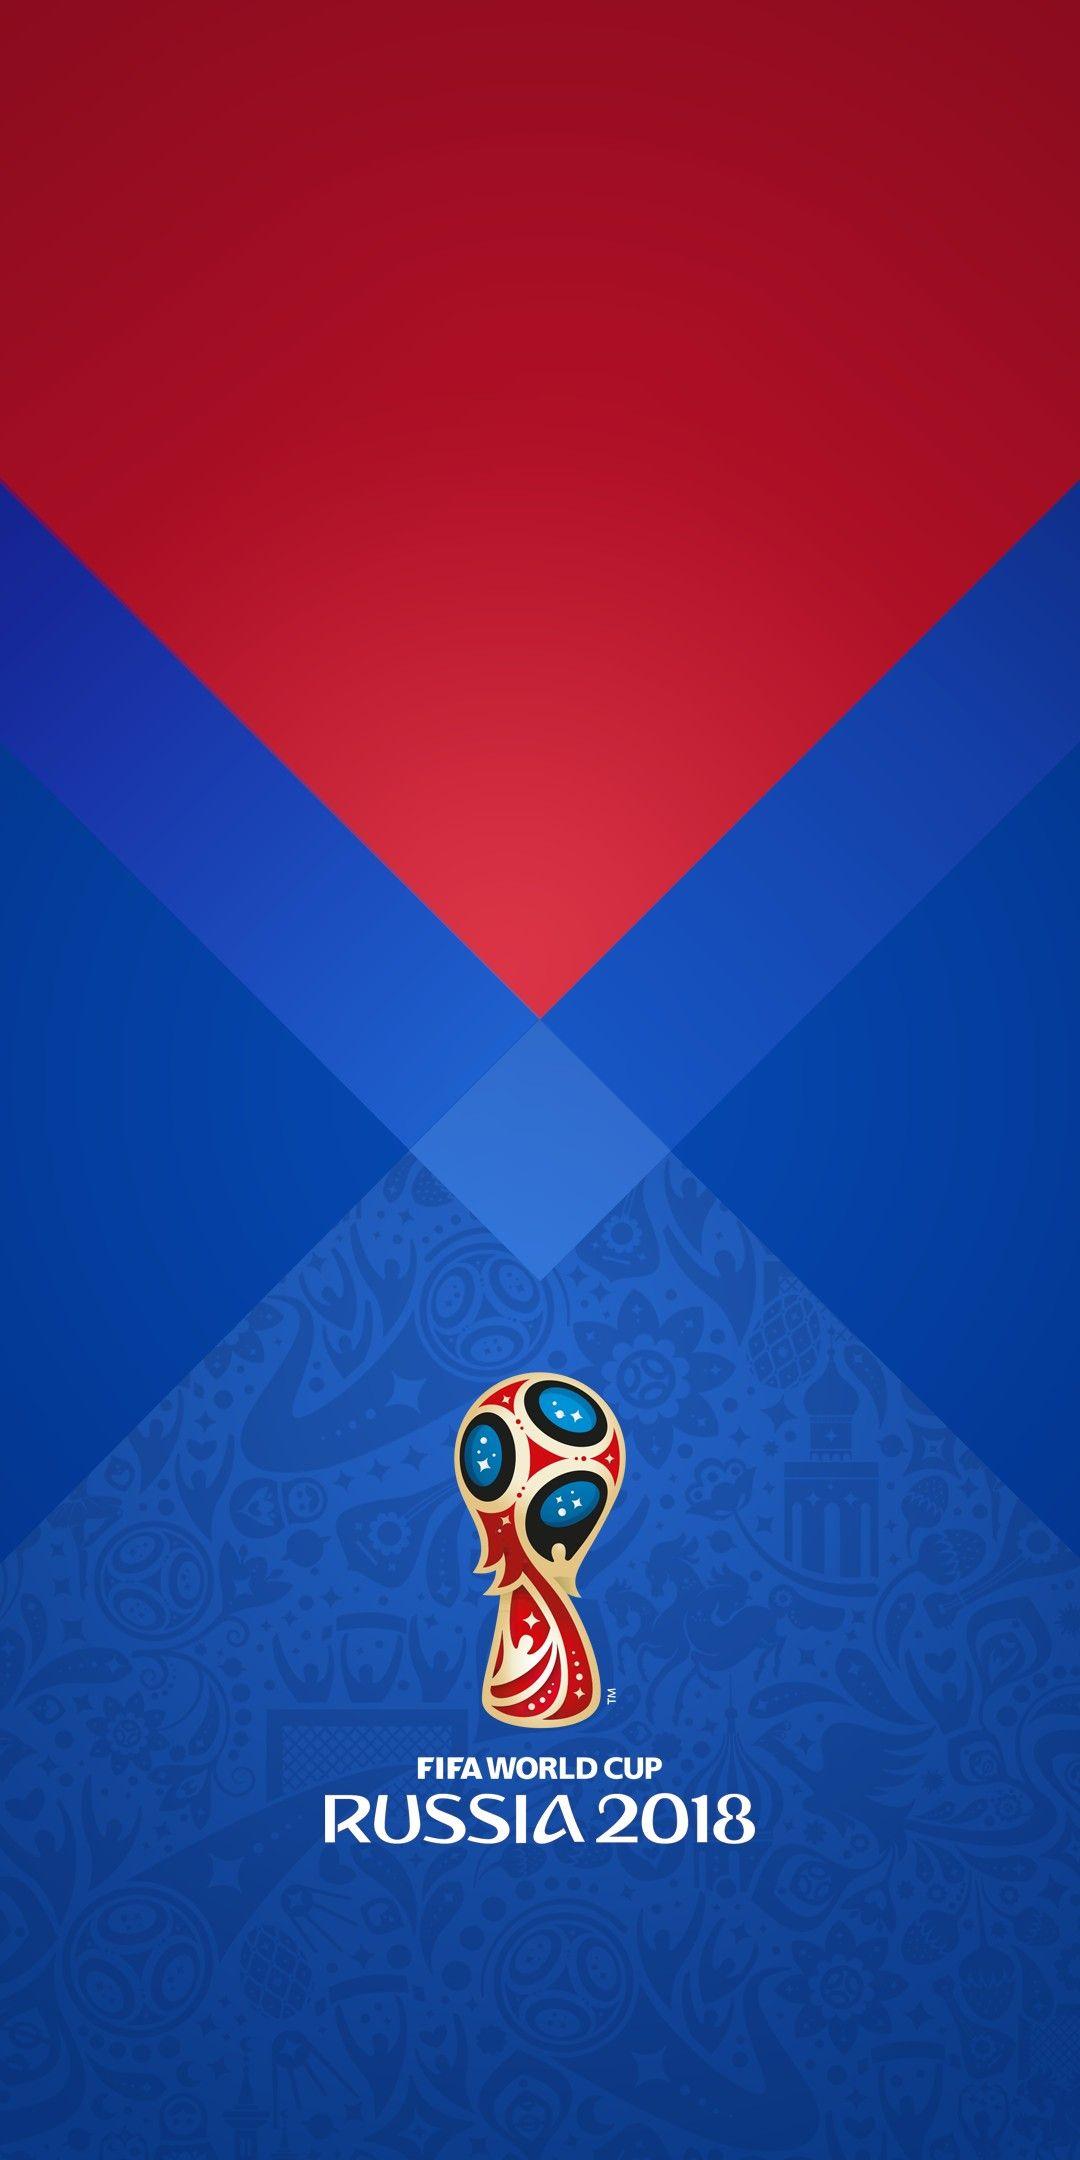 World Cup Wallpaper Rusia 2018 Equipo De Futbol Futbol